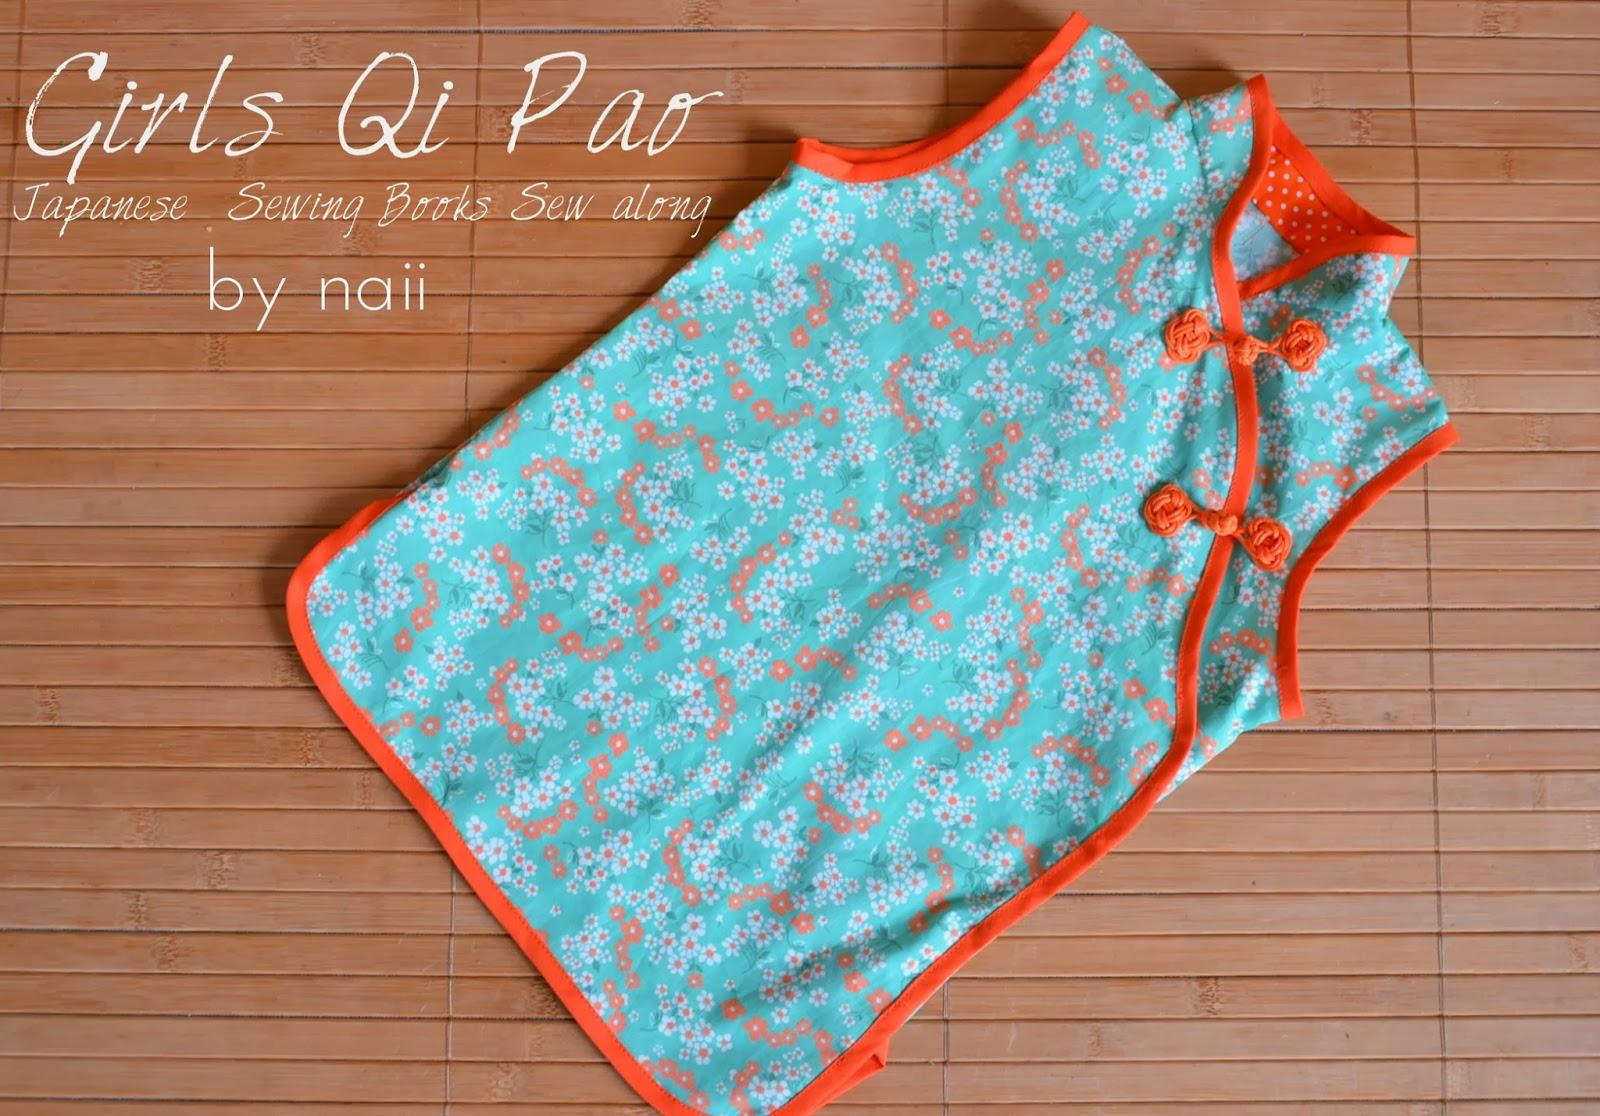 Girls Qi Pao